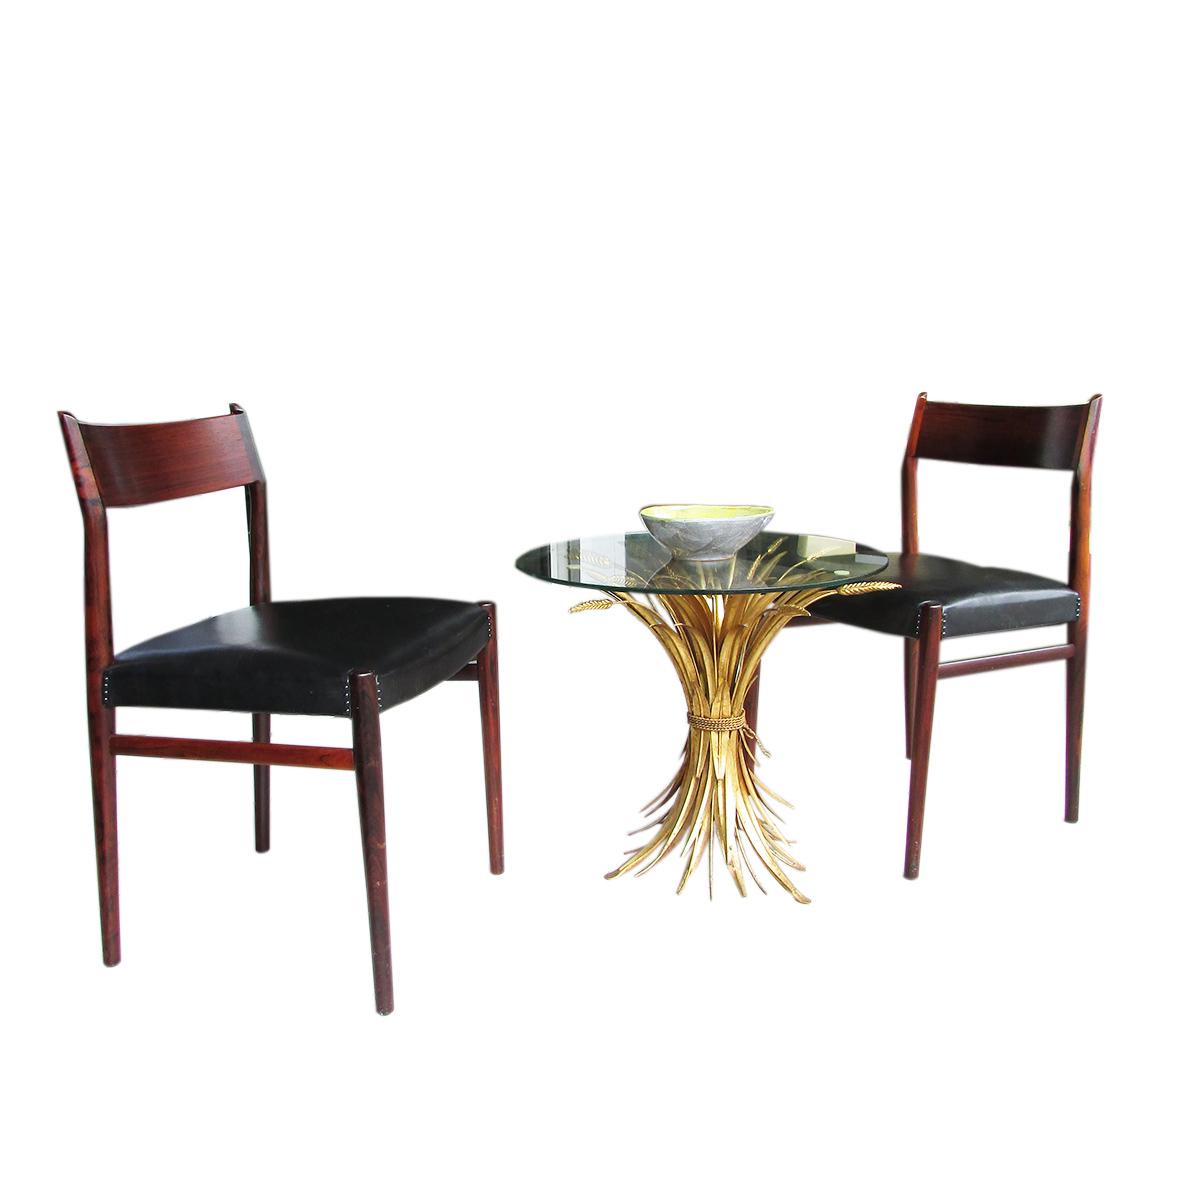 sibast-vodder-rosewood-chair-vintage-denmark